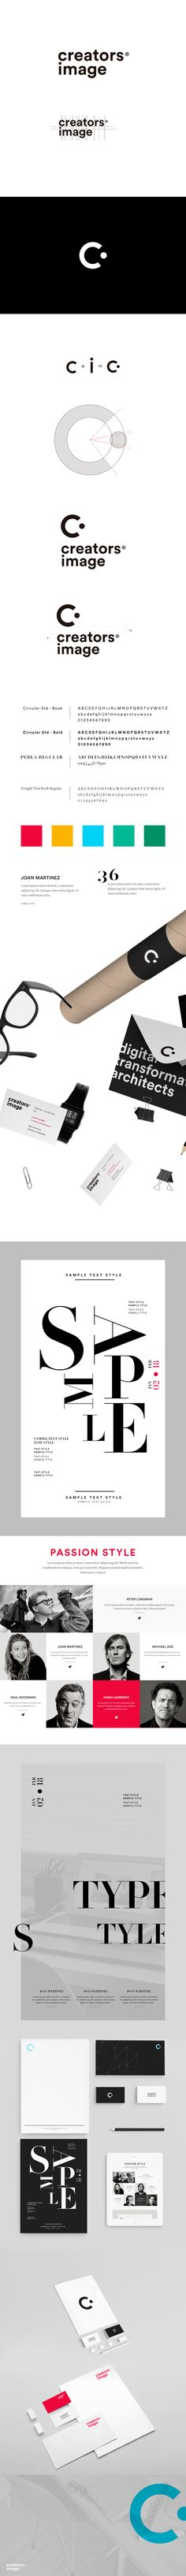 Brand Identity for Creators Image. #typography #identity #branding #brandidentity